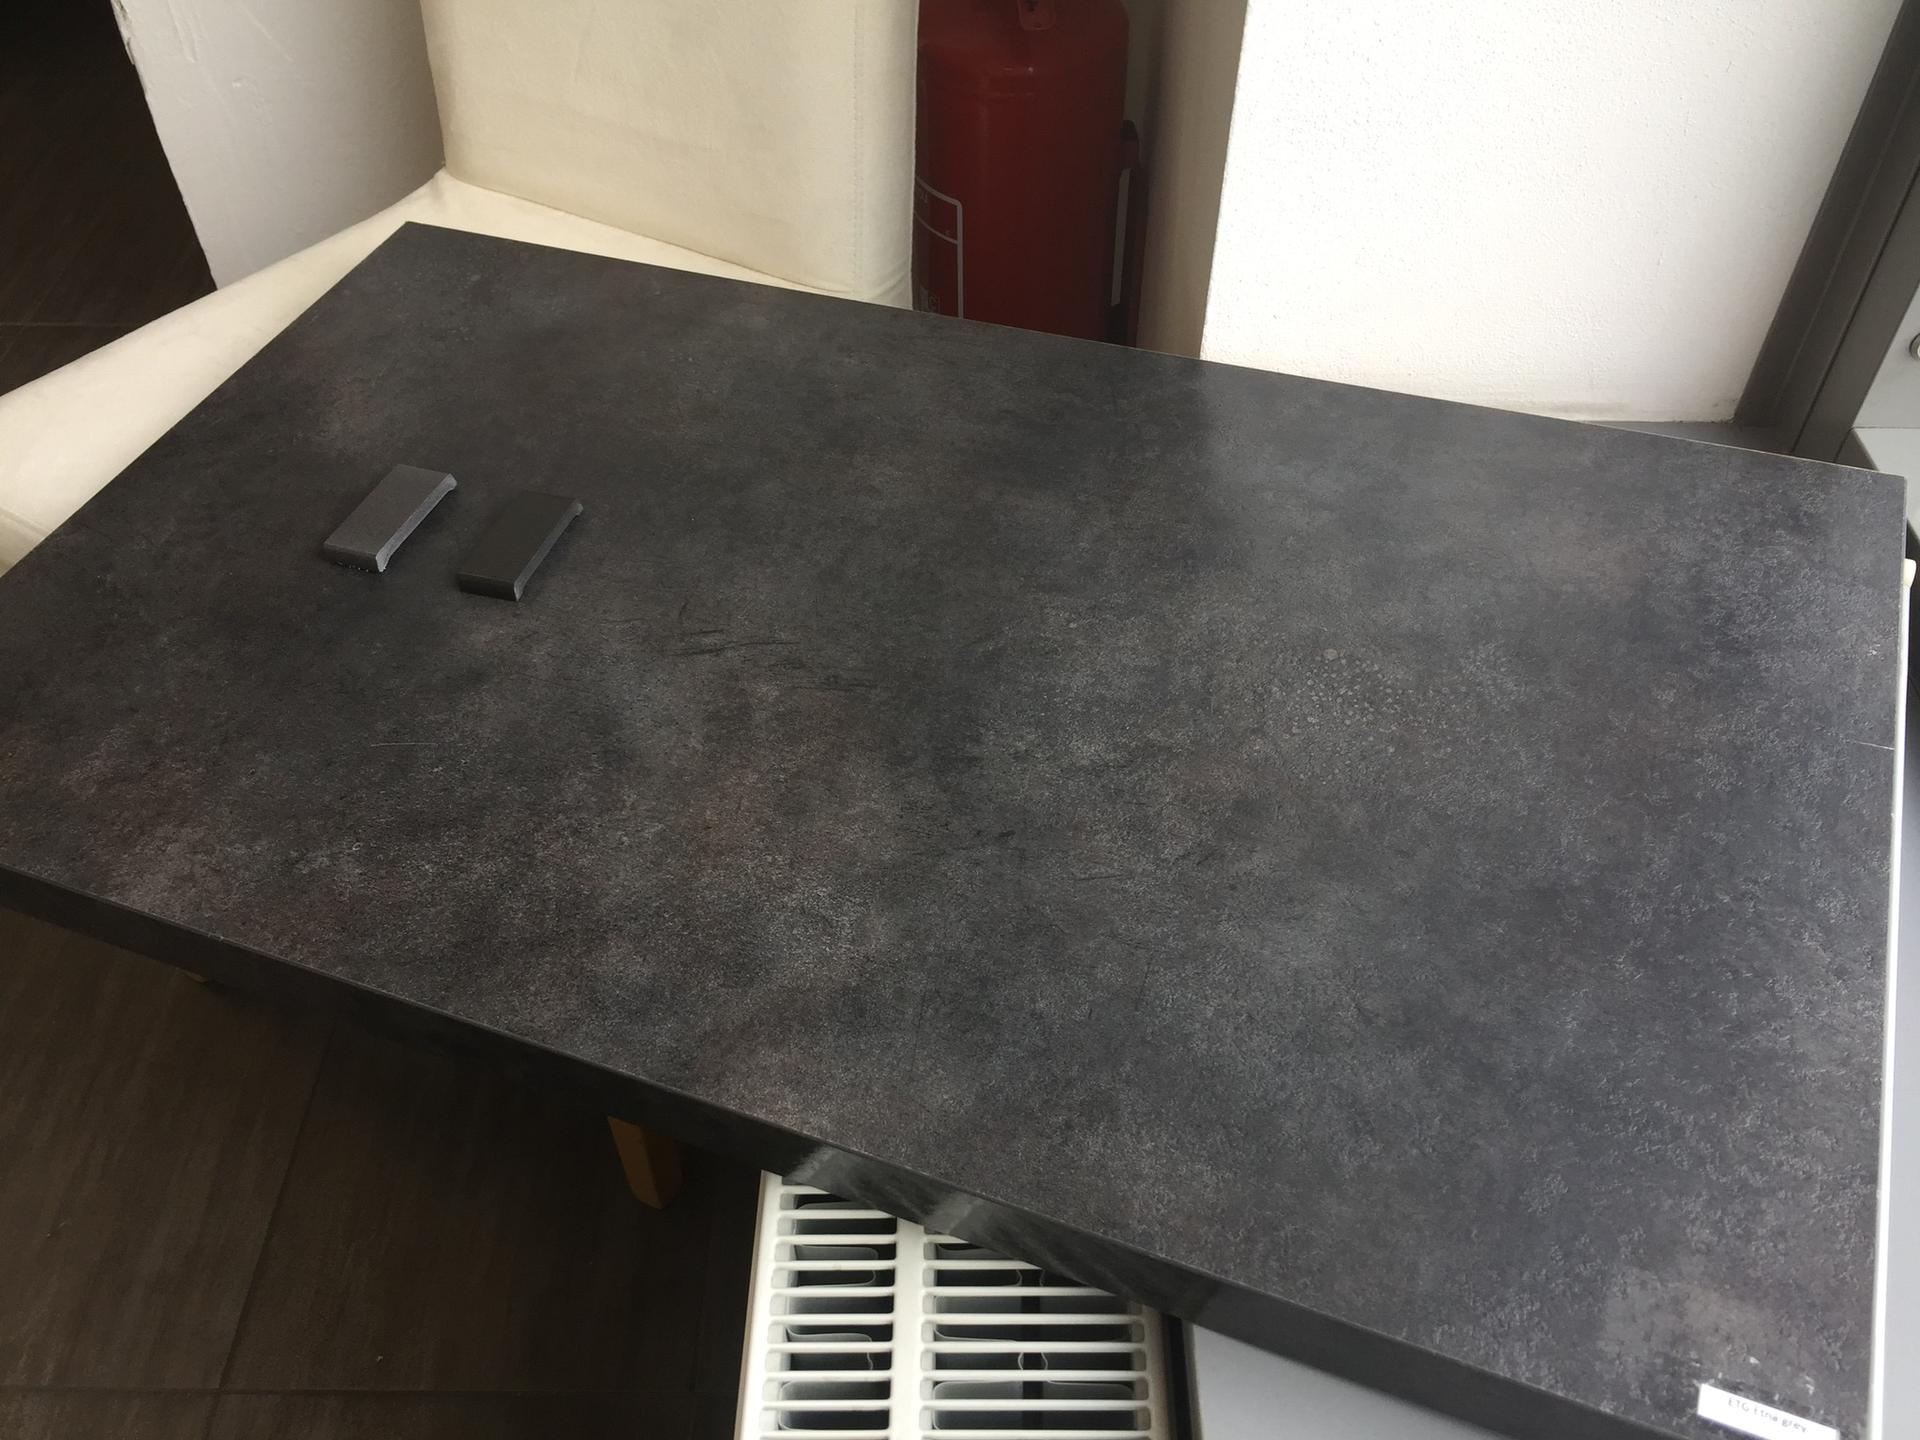 druha kuchyn od Schmidta ( finalni verze) - deska etna grey